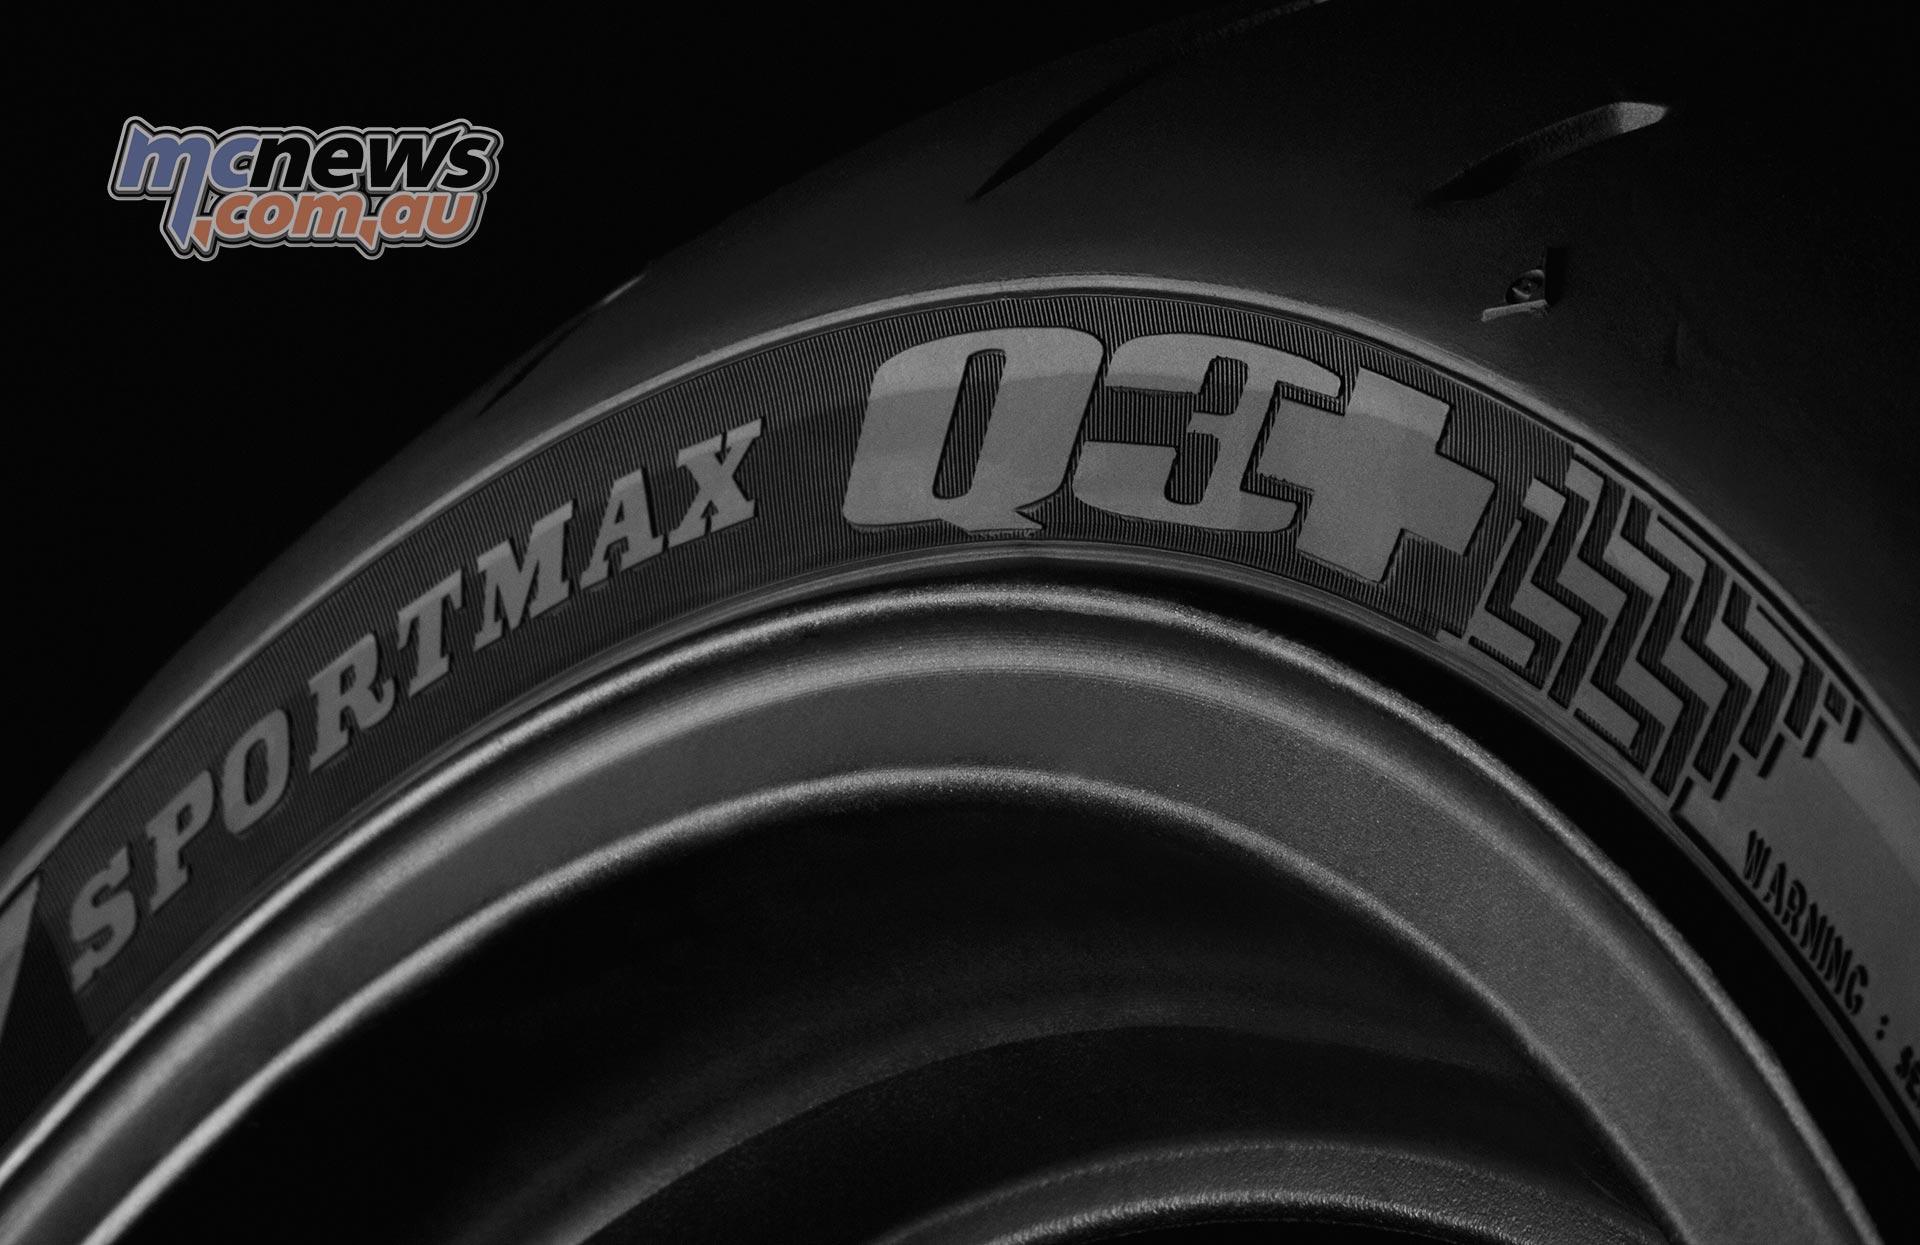 Dunlop's Sportmax Q3+